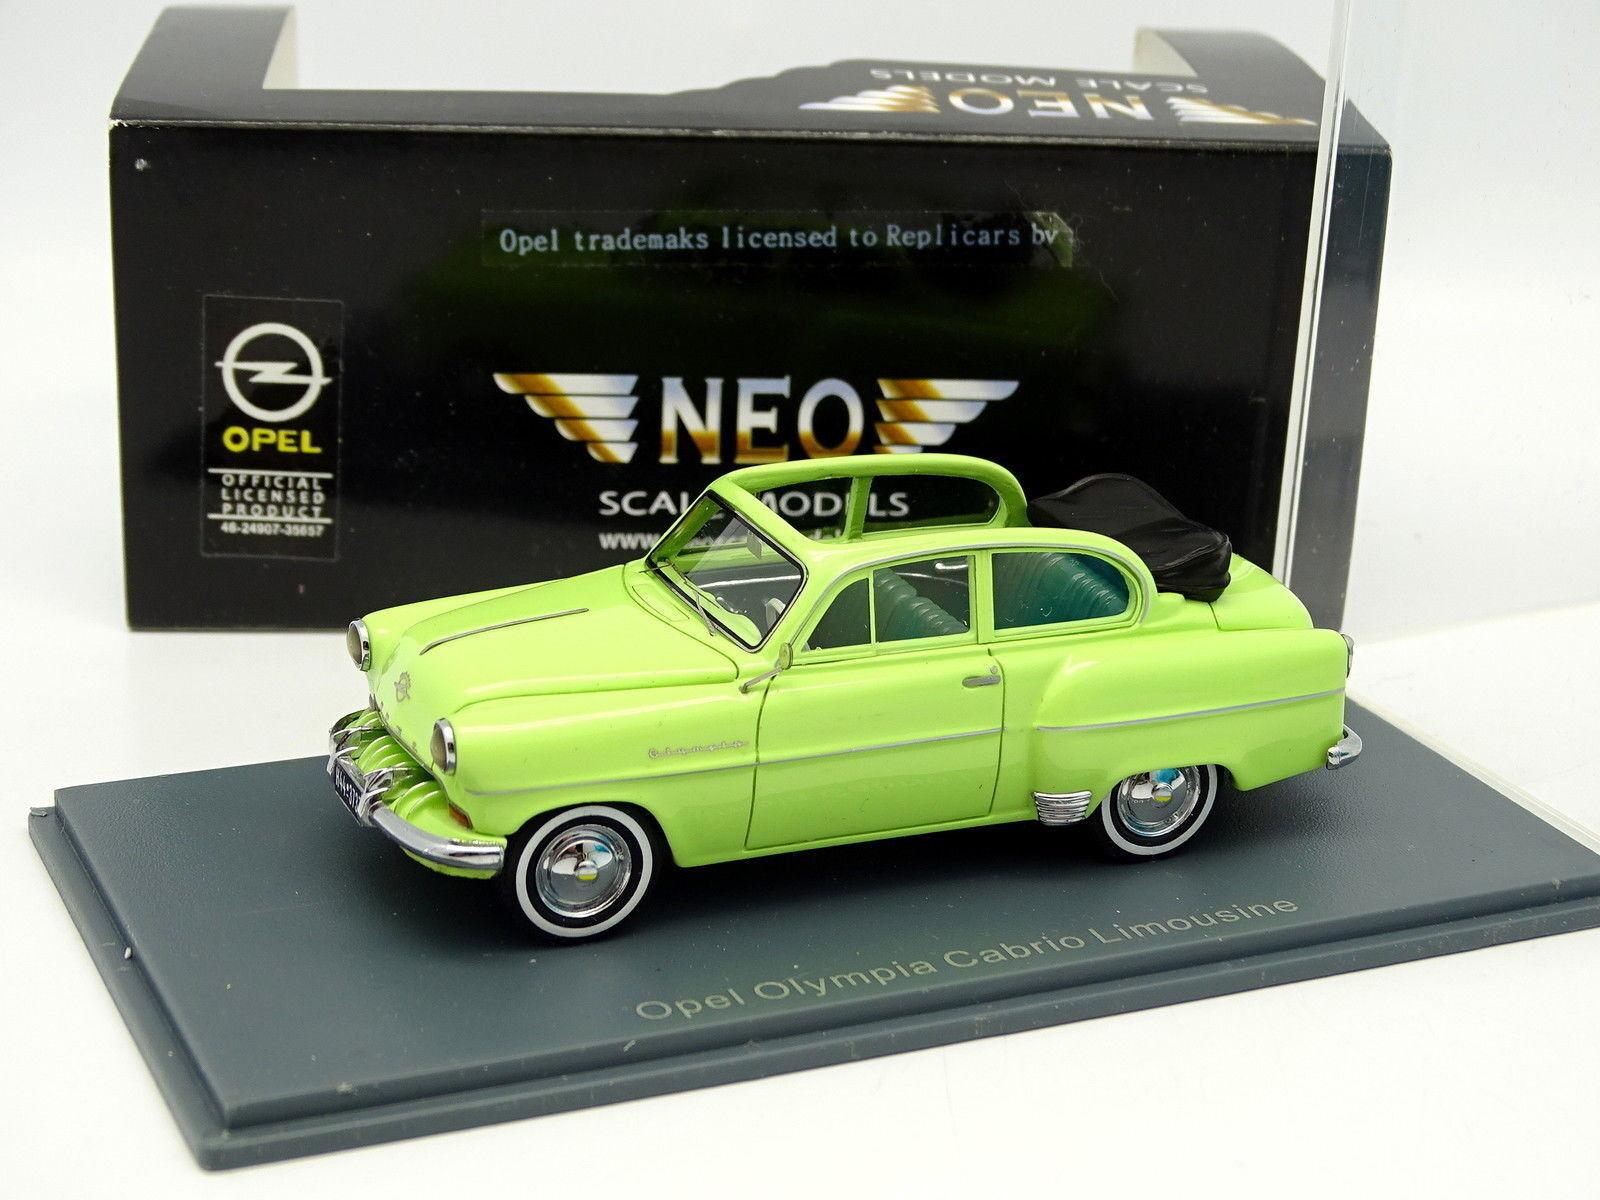 Neo 1 43 - Opel Olympia Cabrio Limousine greene